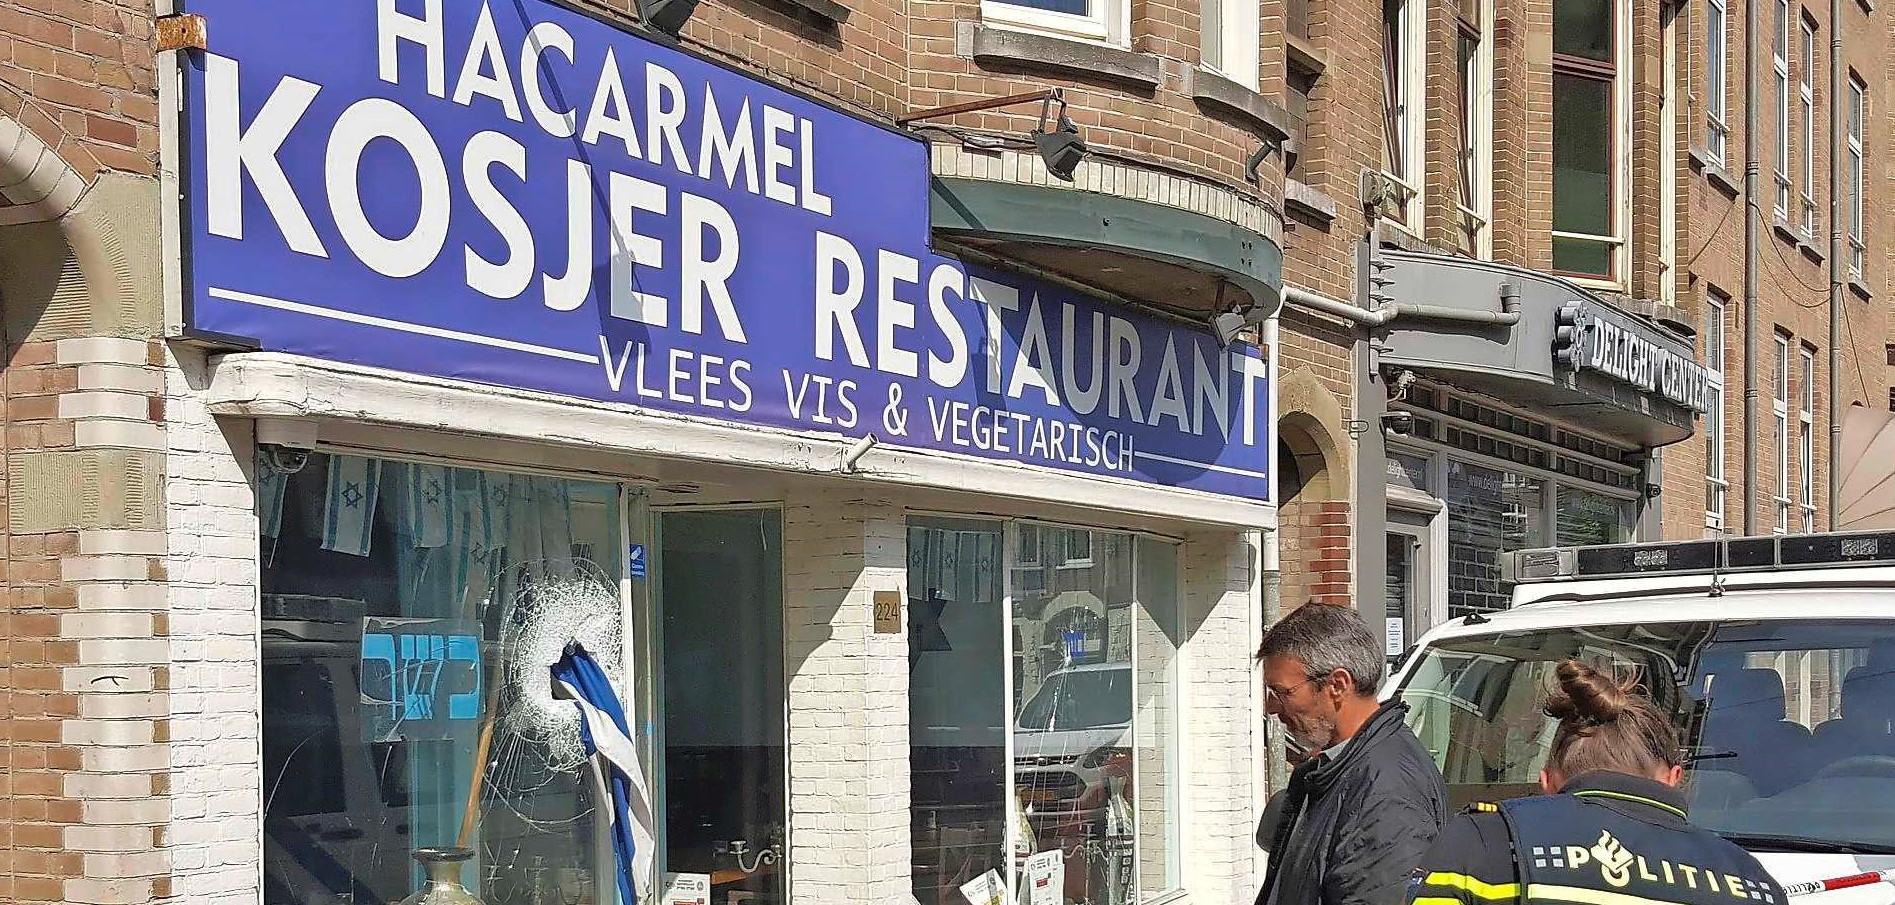 Koosjer restaurant opnieuw doelwit van antisemitisme